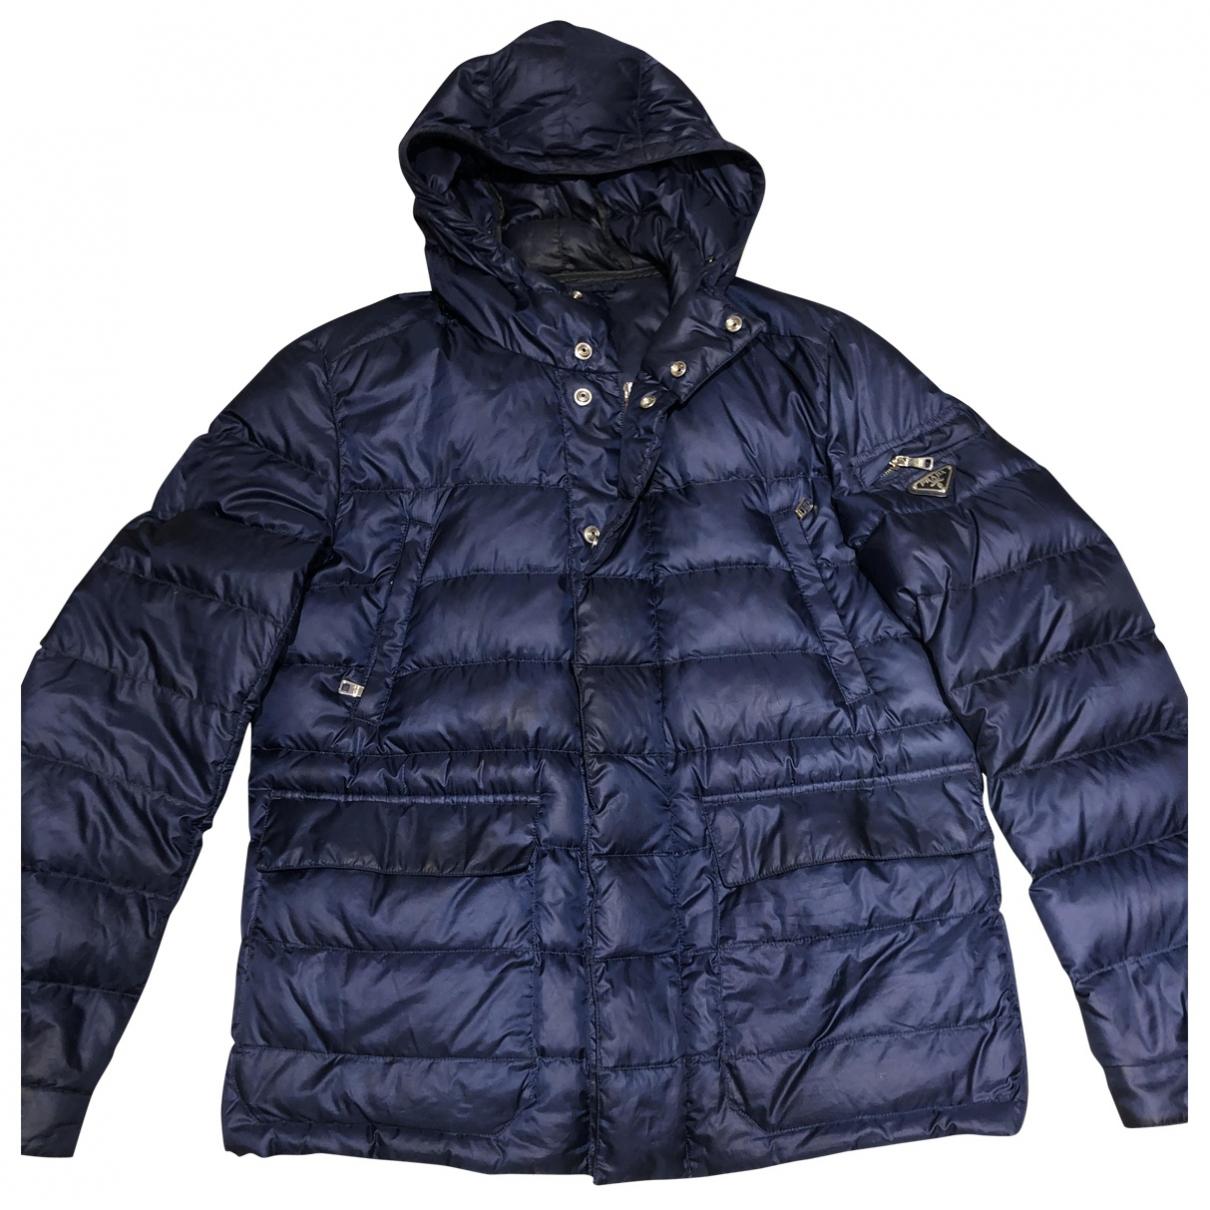 Prada \N Navy coat  for Men 52 IT